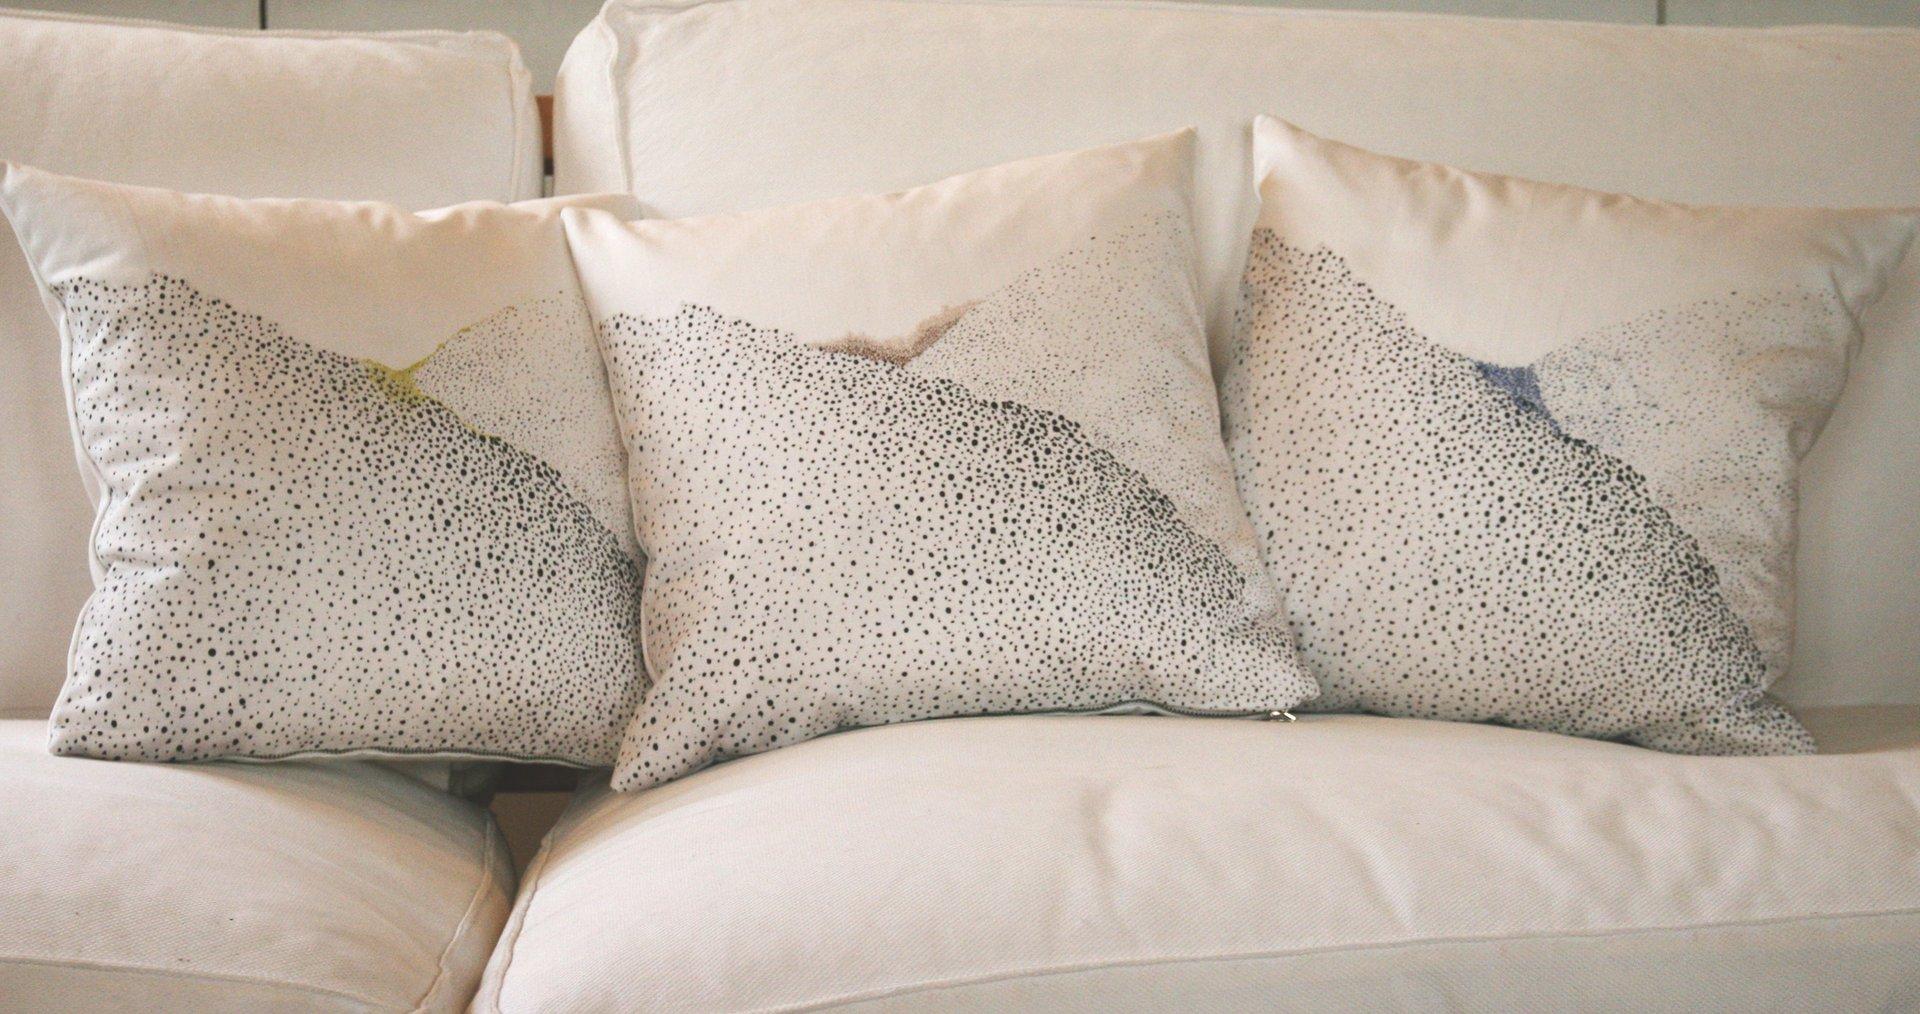 waiting for the sun kissen von alix waline sabatina leccia f r chiara colombini editions bei. Black Bedroom Furniture Sets. Home Design Ideas